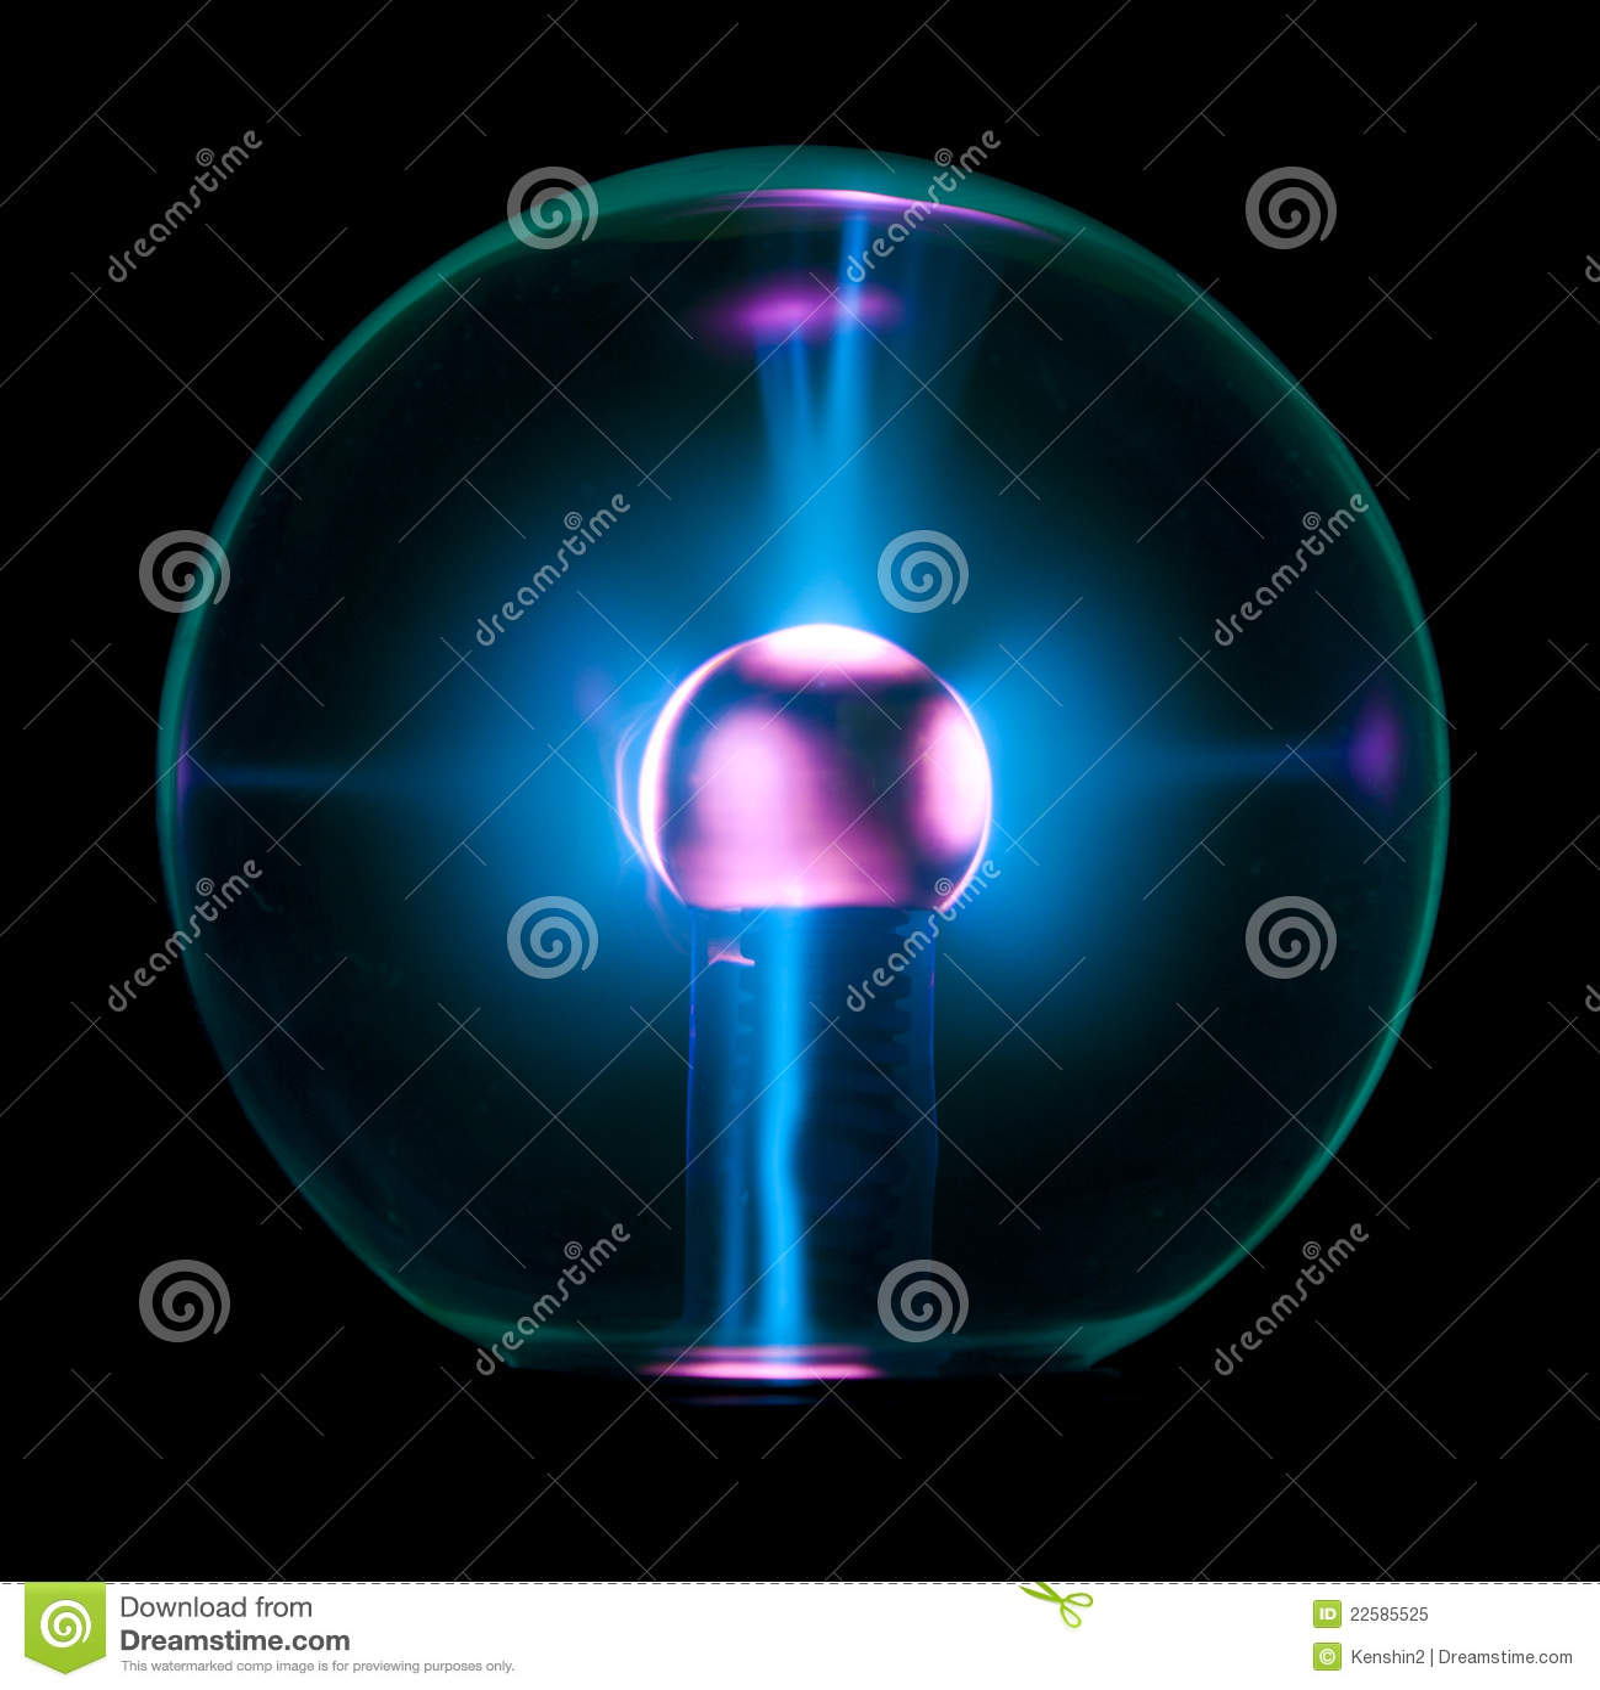 electrostatic ball stock image  image of pattern  globe